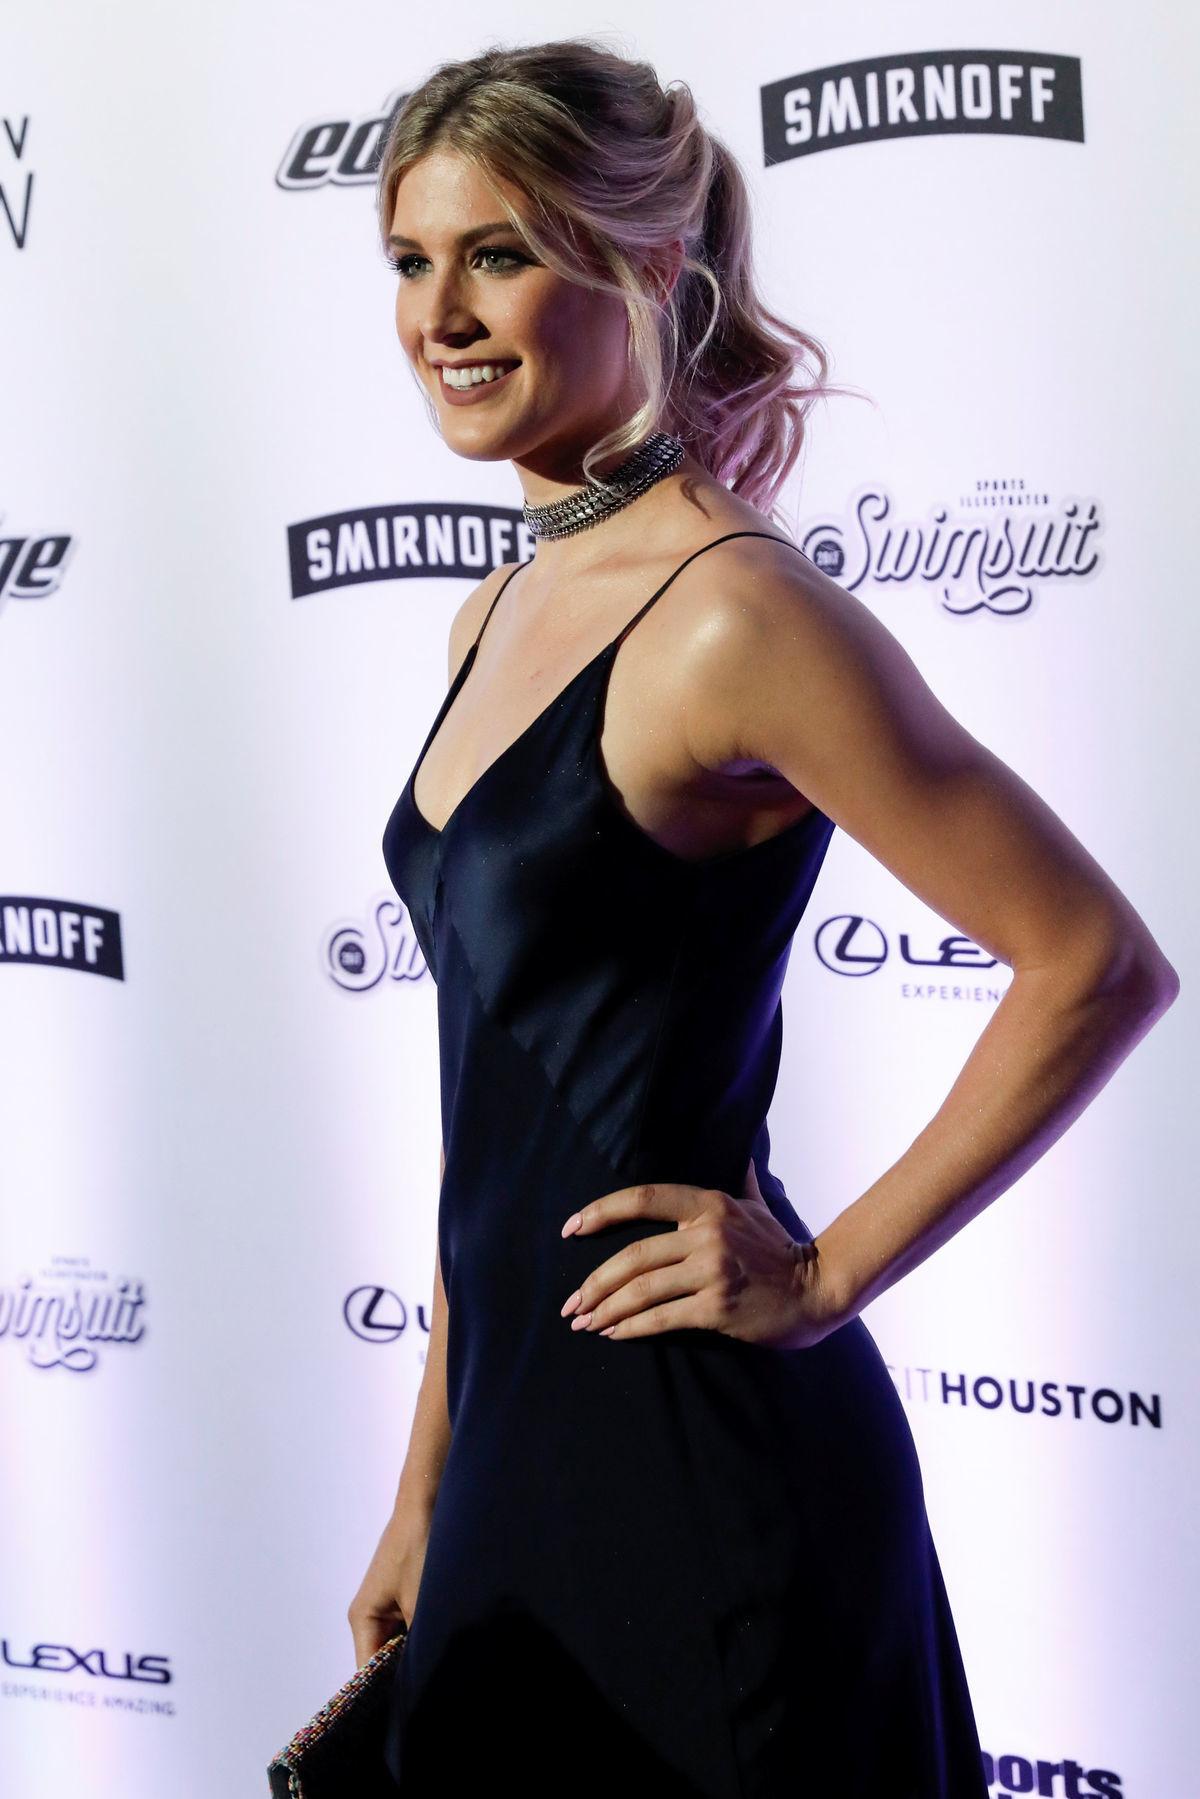 Tenistka a modelka Eugenie Bouchard.